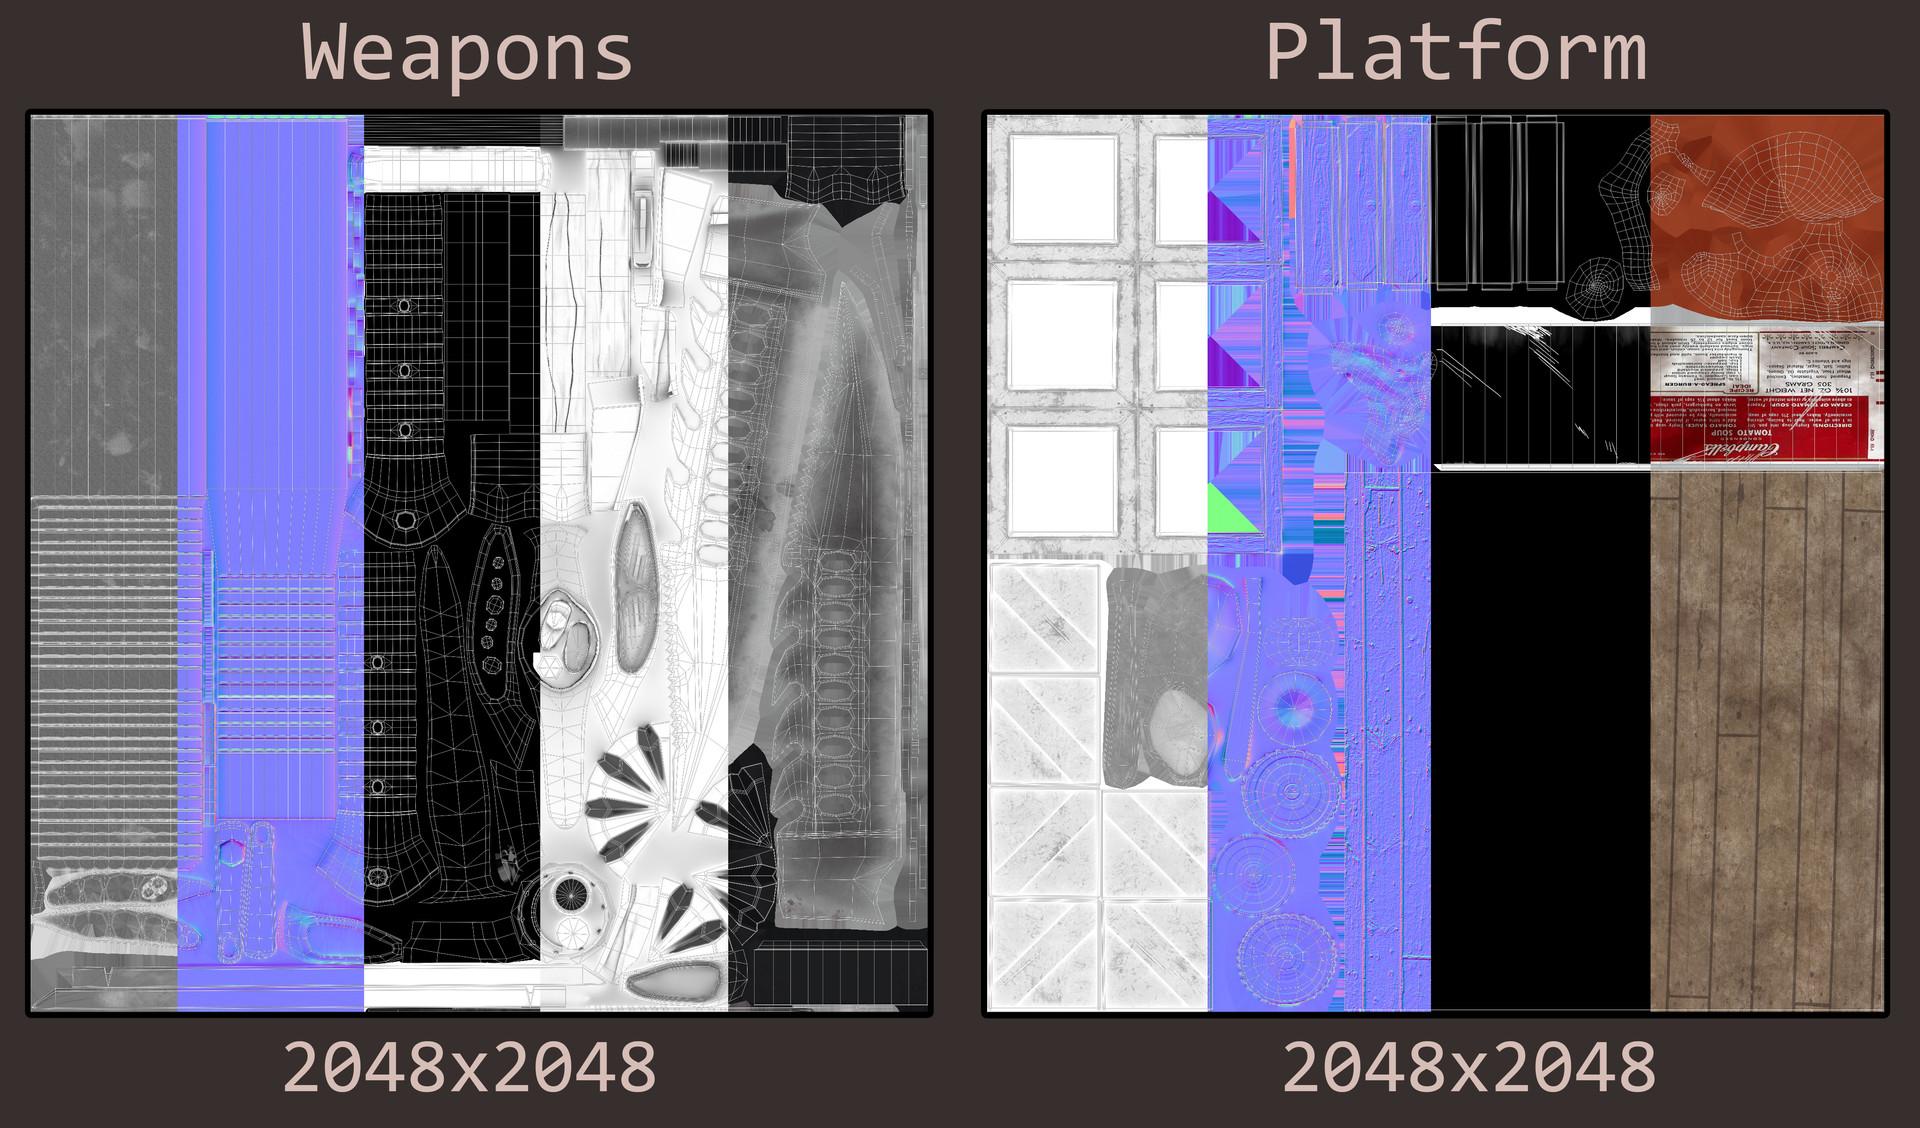 Klara fredriksson texturesheets platformandweapons